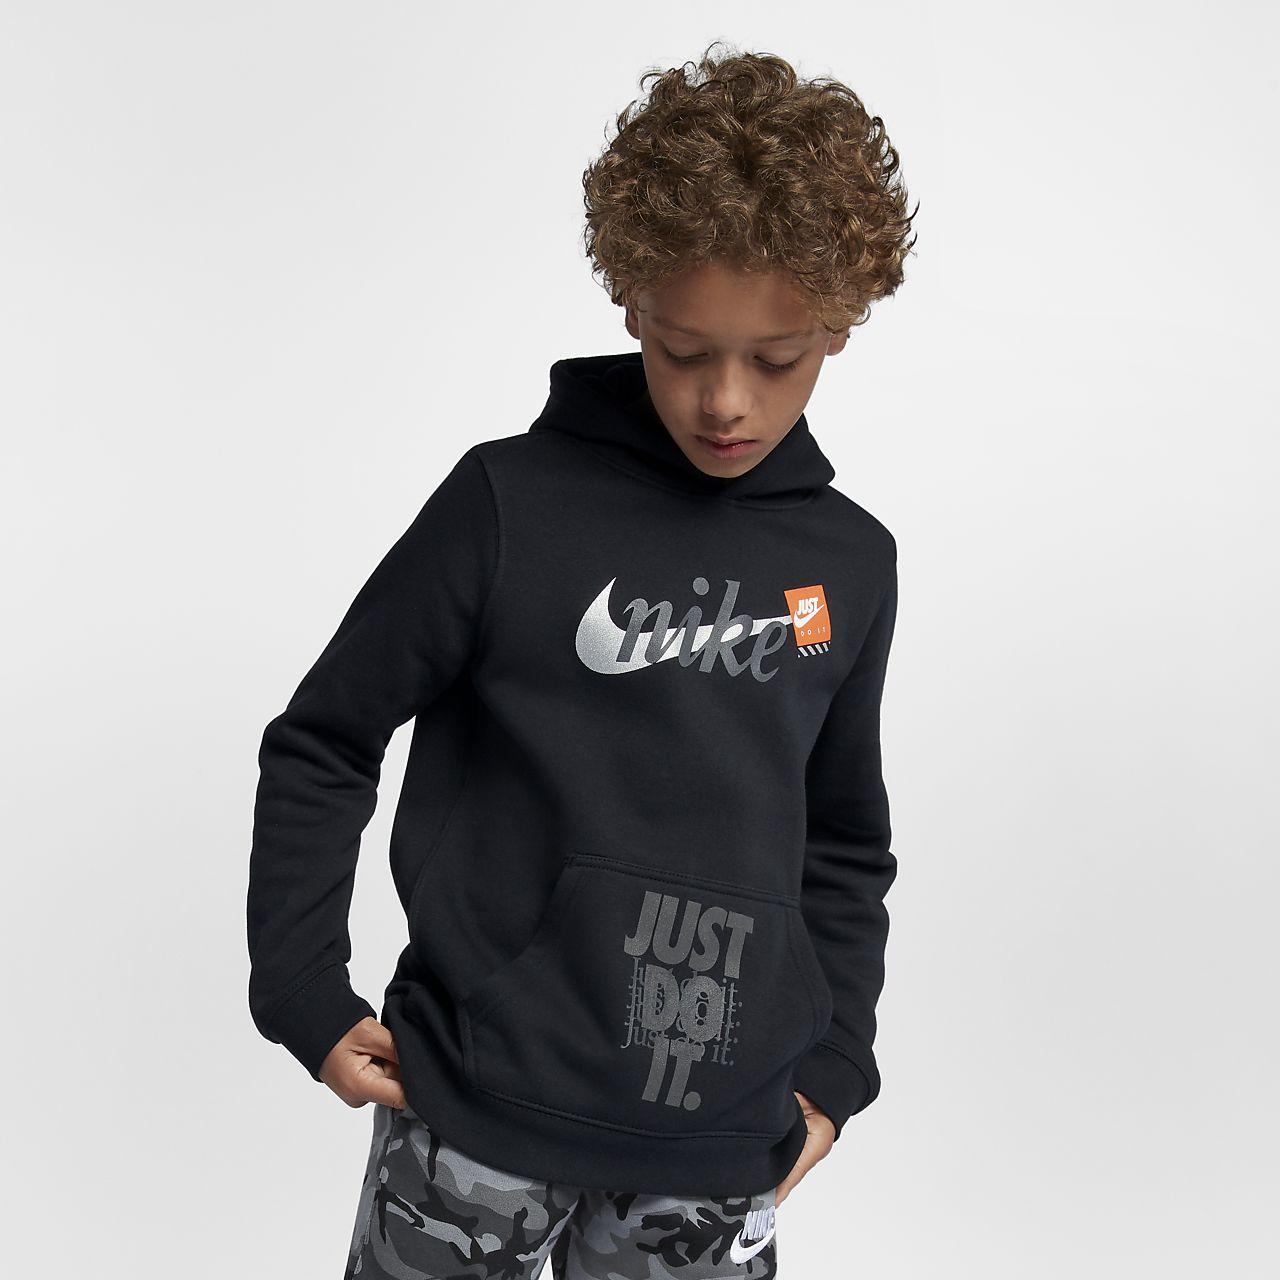 Nike Sportswear Big Kids  (Boys ) Just Do It Pullover Hoodie. Nike.com 360a34f4c